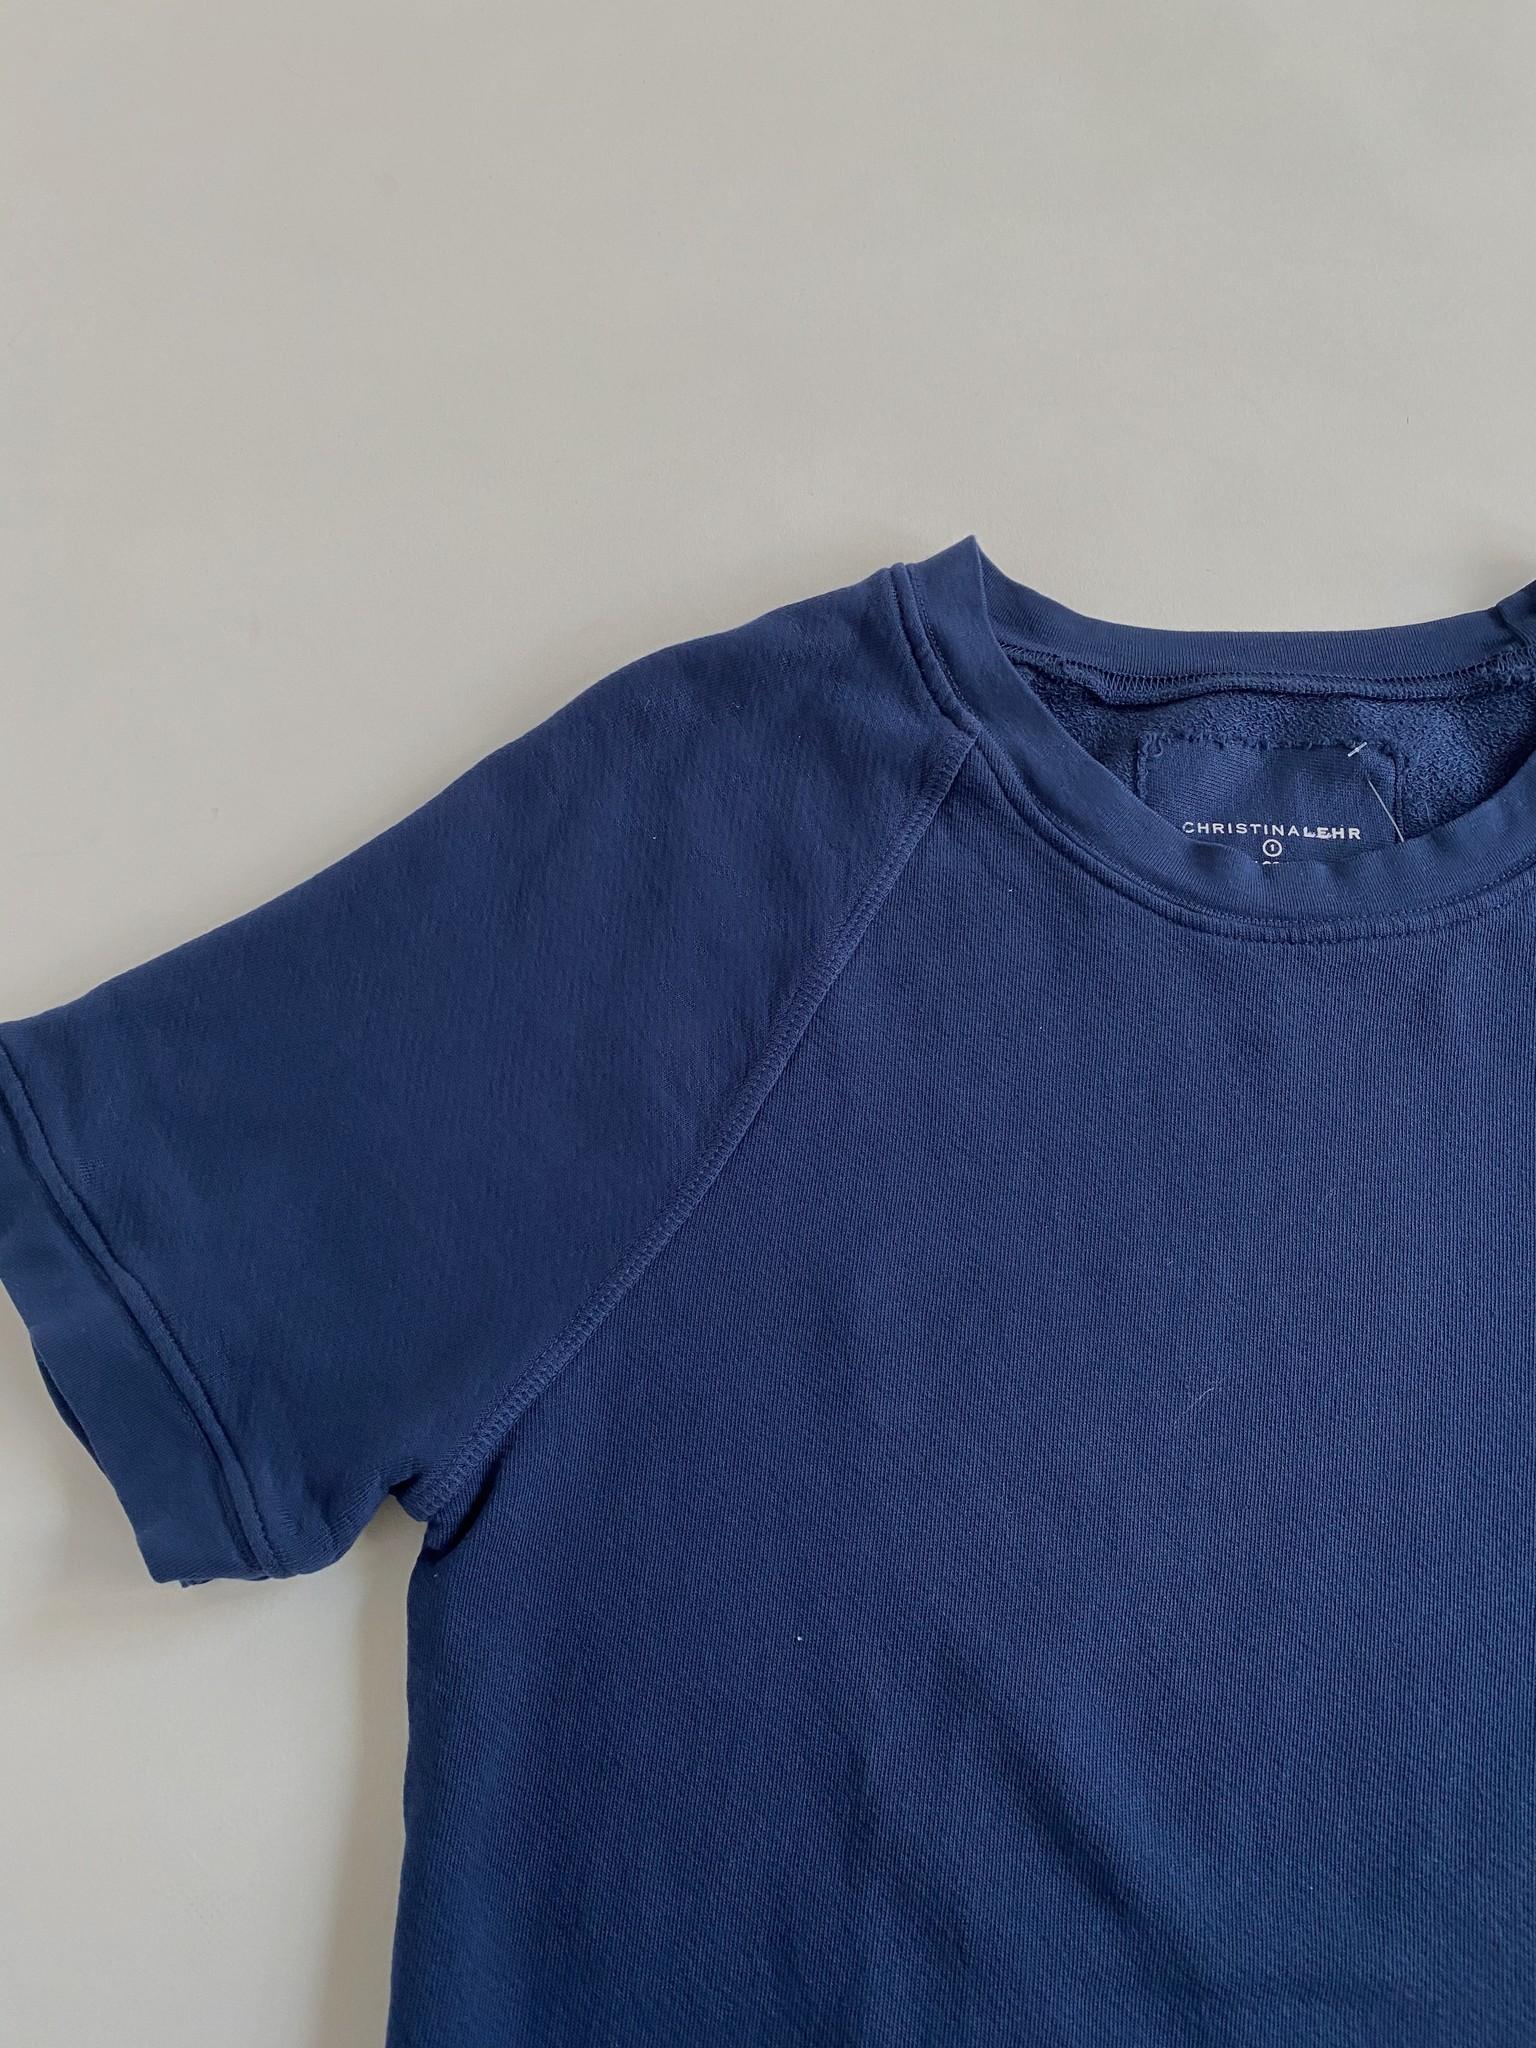 christina Lehr Christina Lehr Varsity  Cotton Sweatshirt